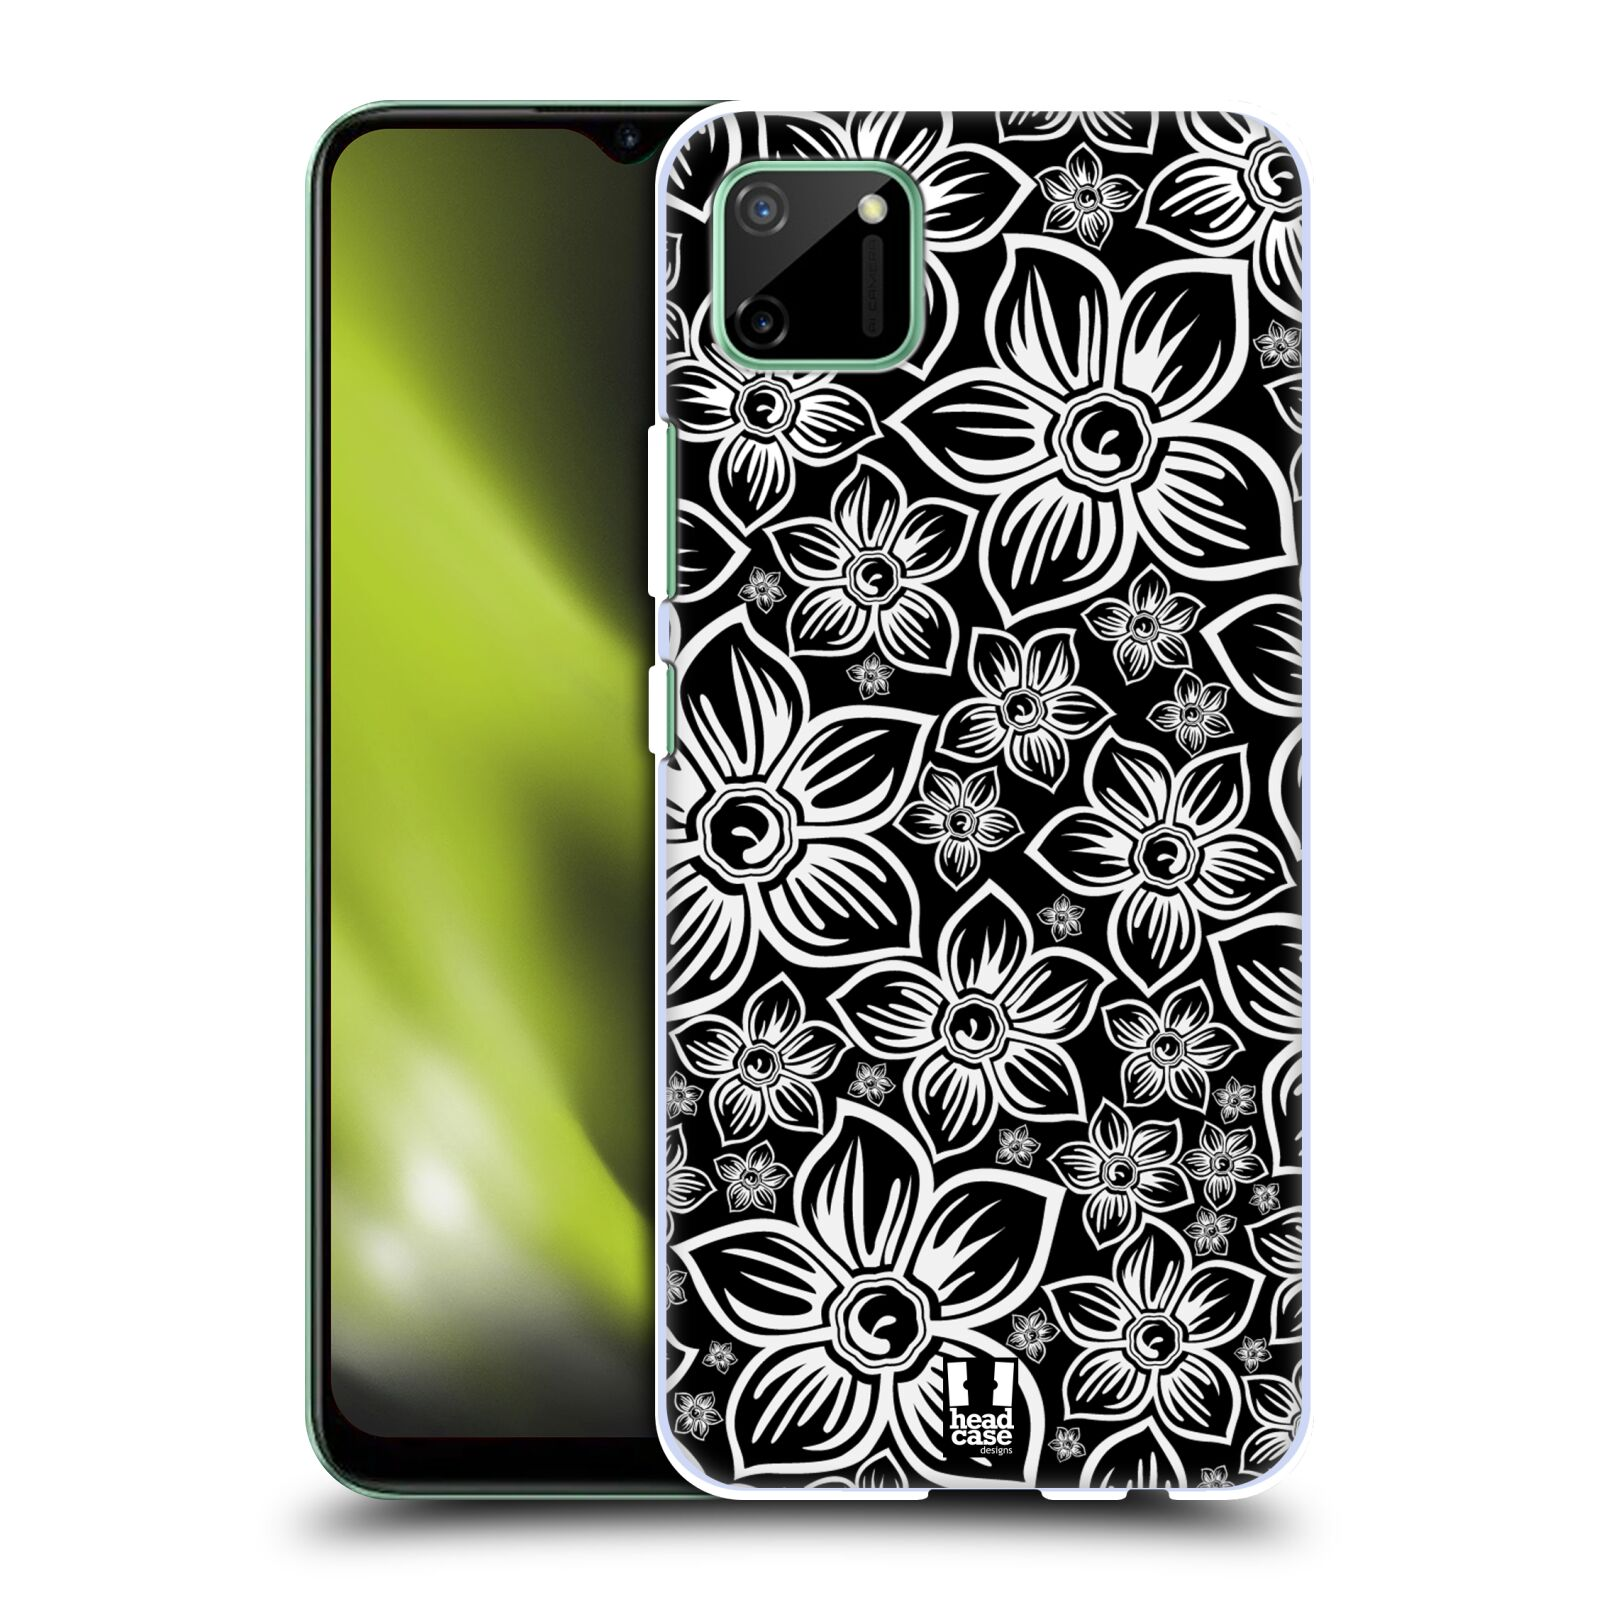 Plastové pouzdro na mobil Realme C11 - Head Case - FLORAL DAISY